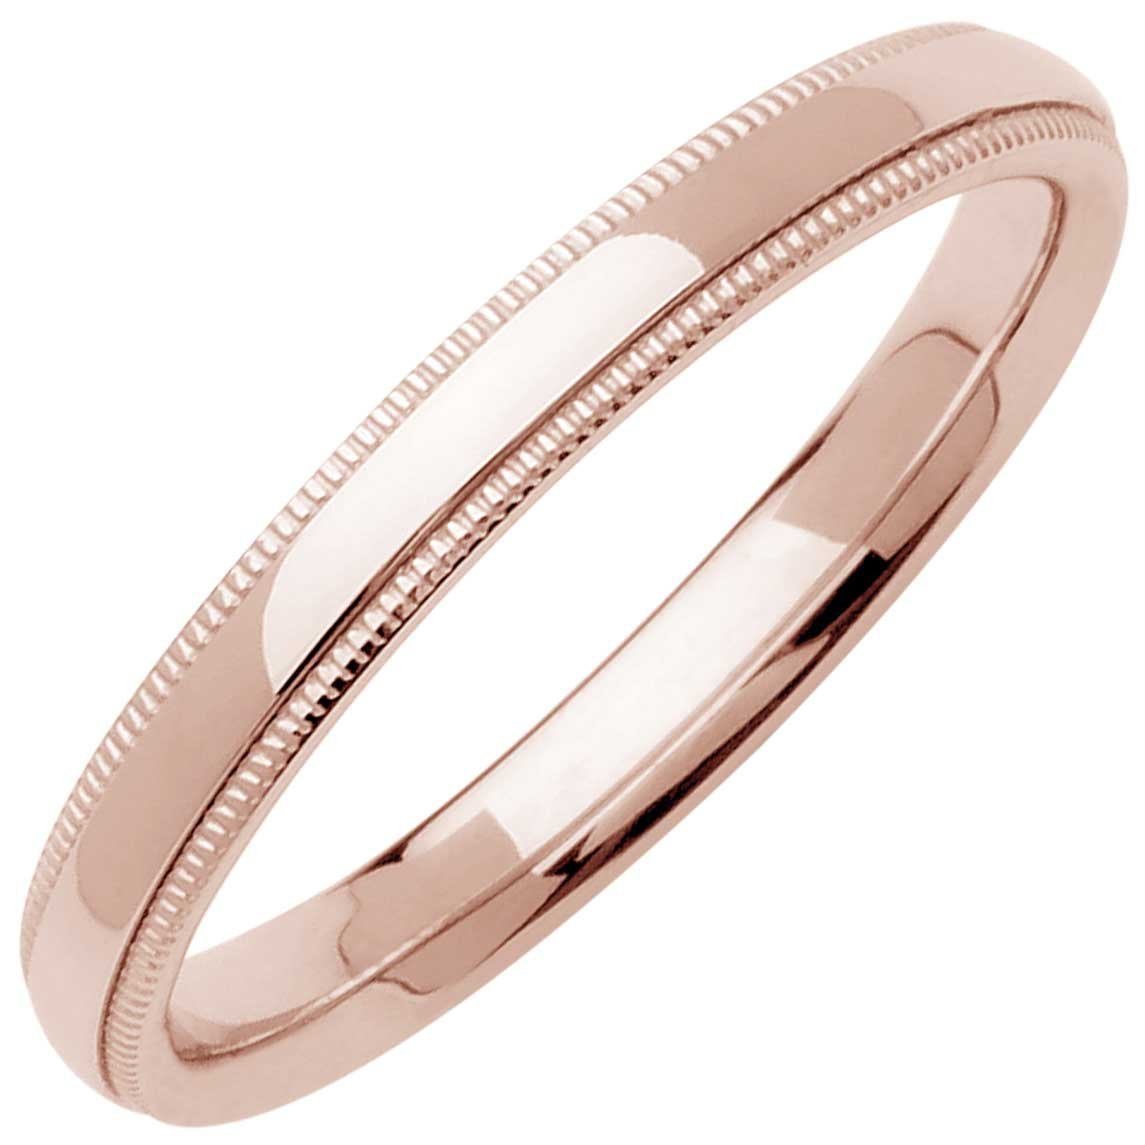 14K Rose Gold Traditional Milgrain Edge Women's Comfort Fit Wedding Band (3mm) Size-7.5c1